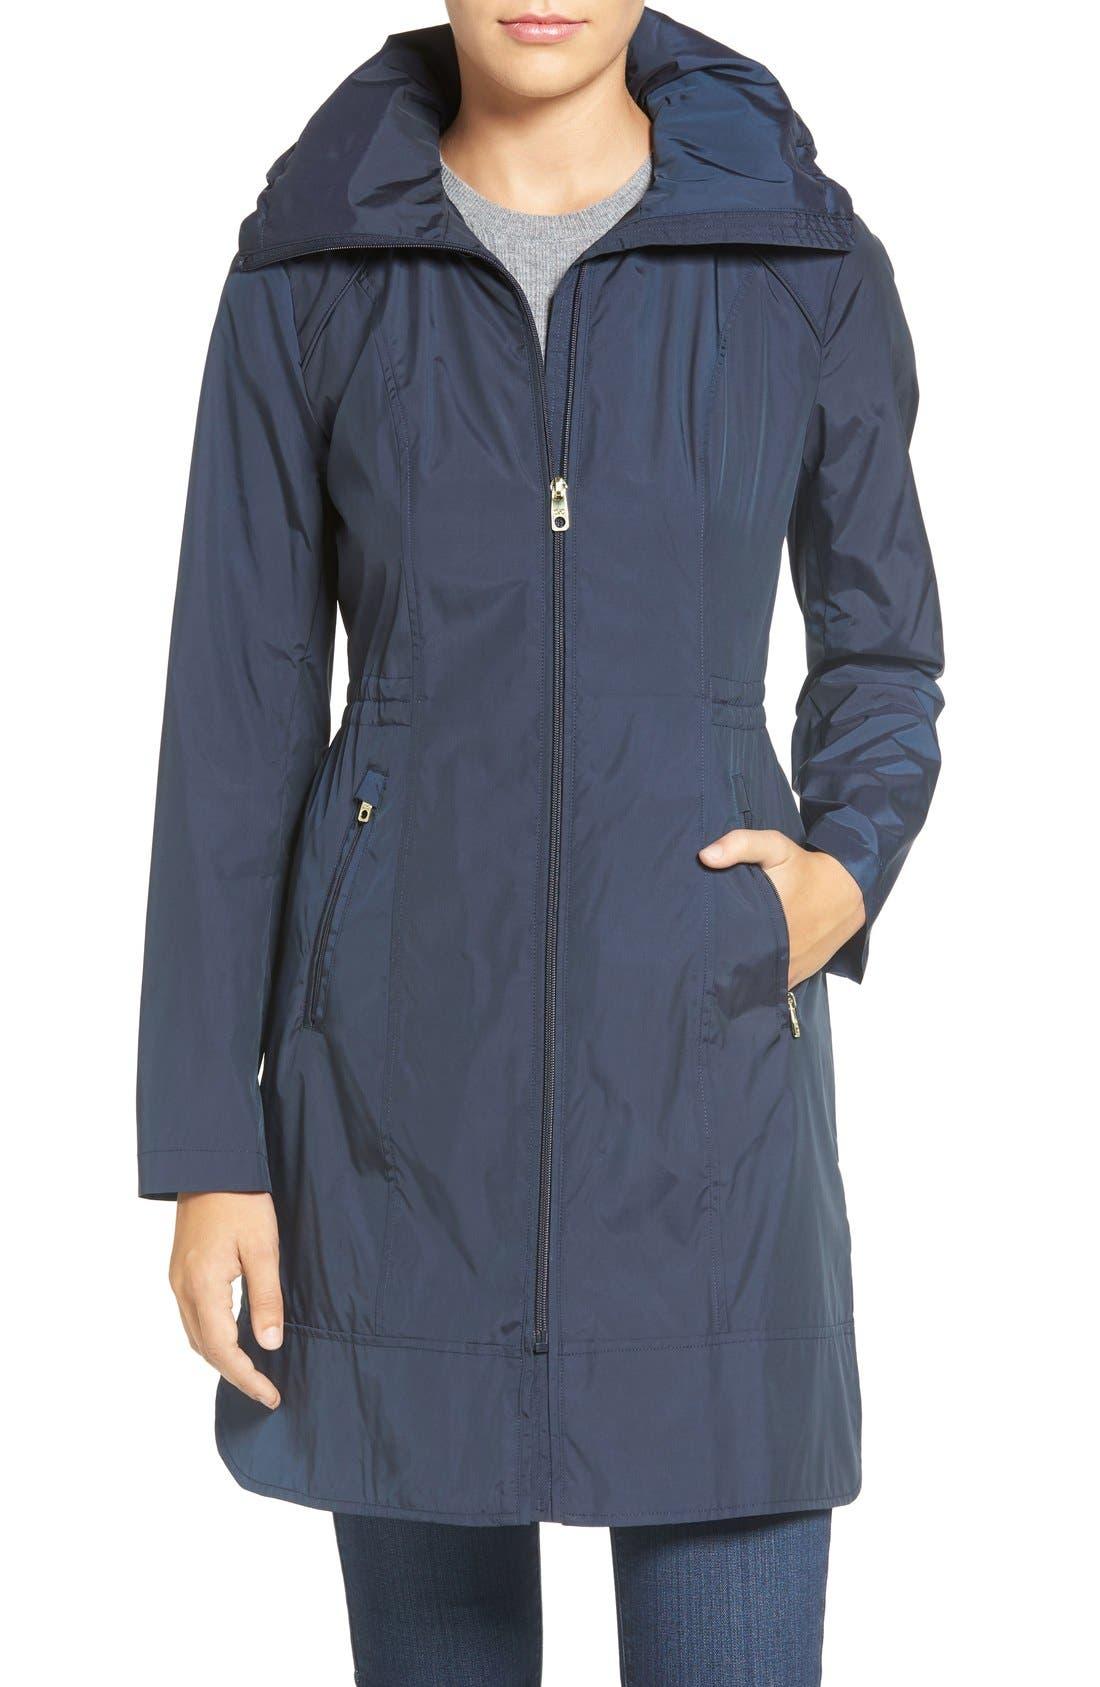 Packable Rain Jacket,                         Main,                         color, Indigo